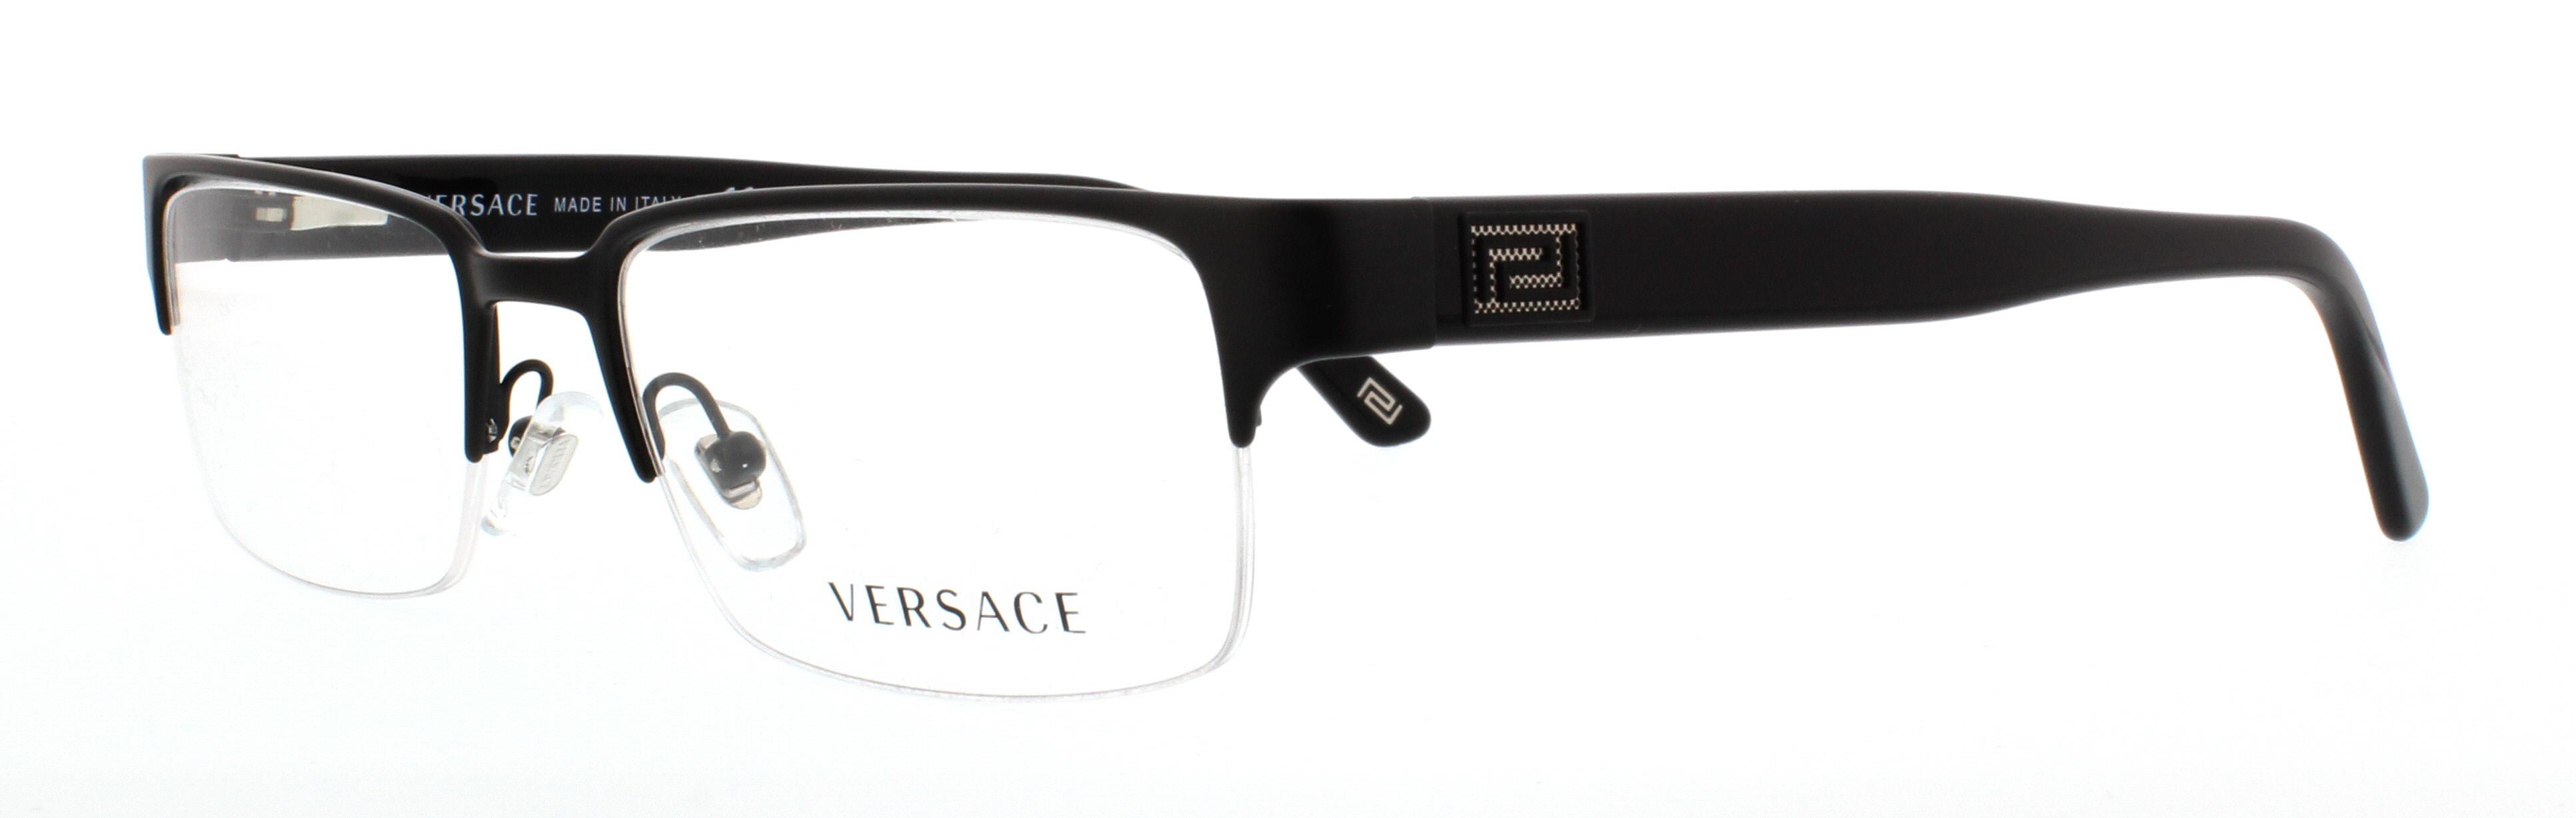 c2cc3b05e751 VERSACE Eyeglasses VE1184 1261 Matte Black 53MM 725125715010